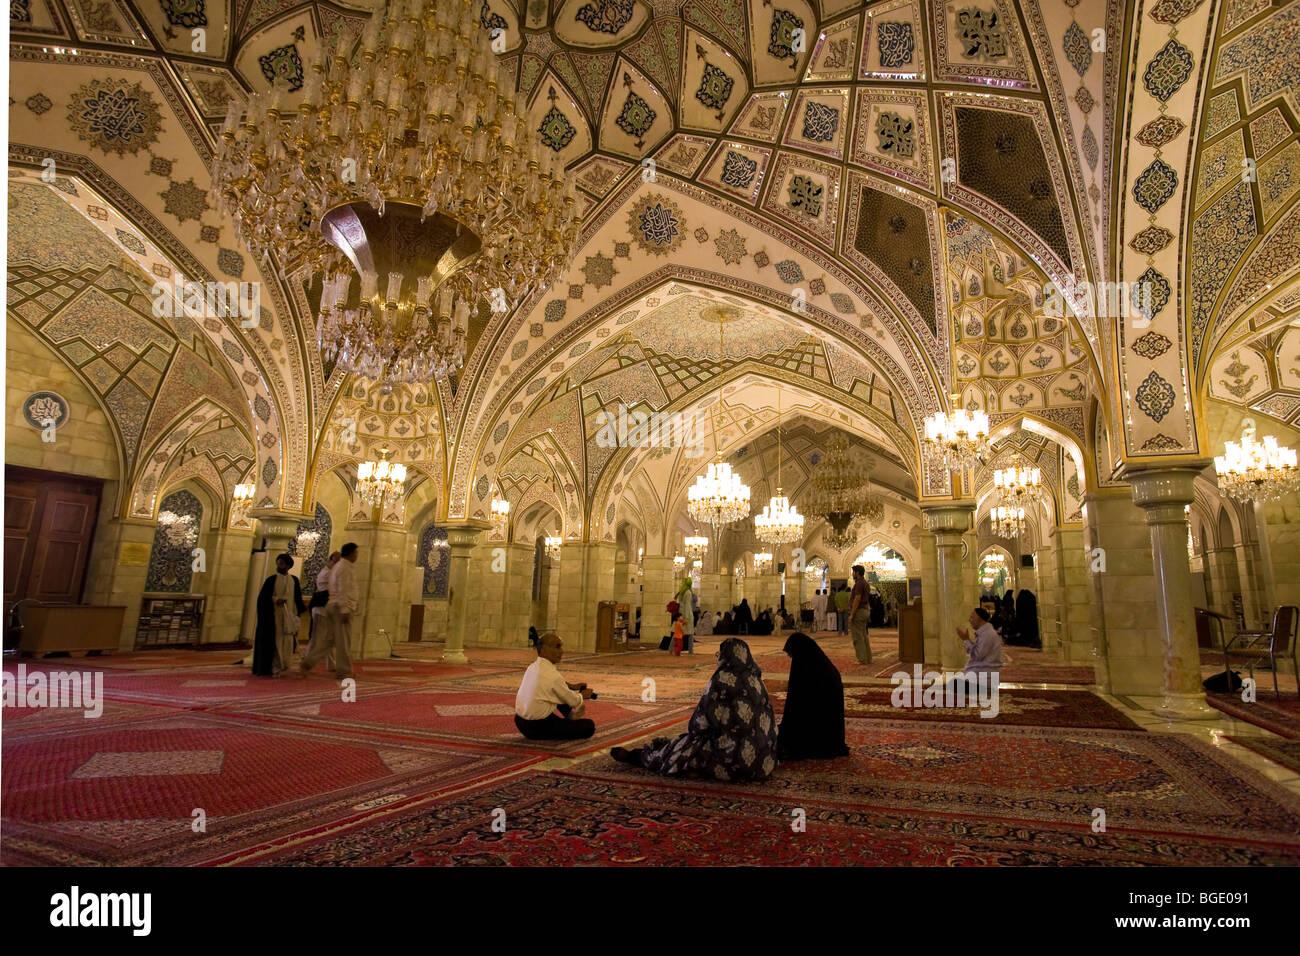 Syria Damascus Old Town Sayyida Ruqayya Mosque Prayer Hall And Stock Photo 27352445 Alamy